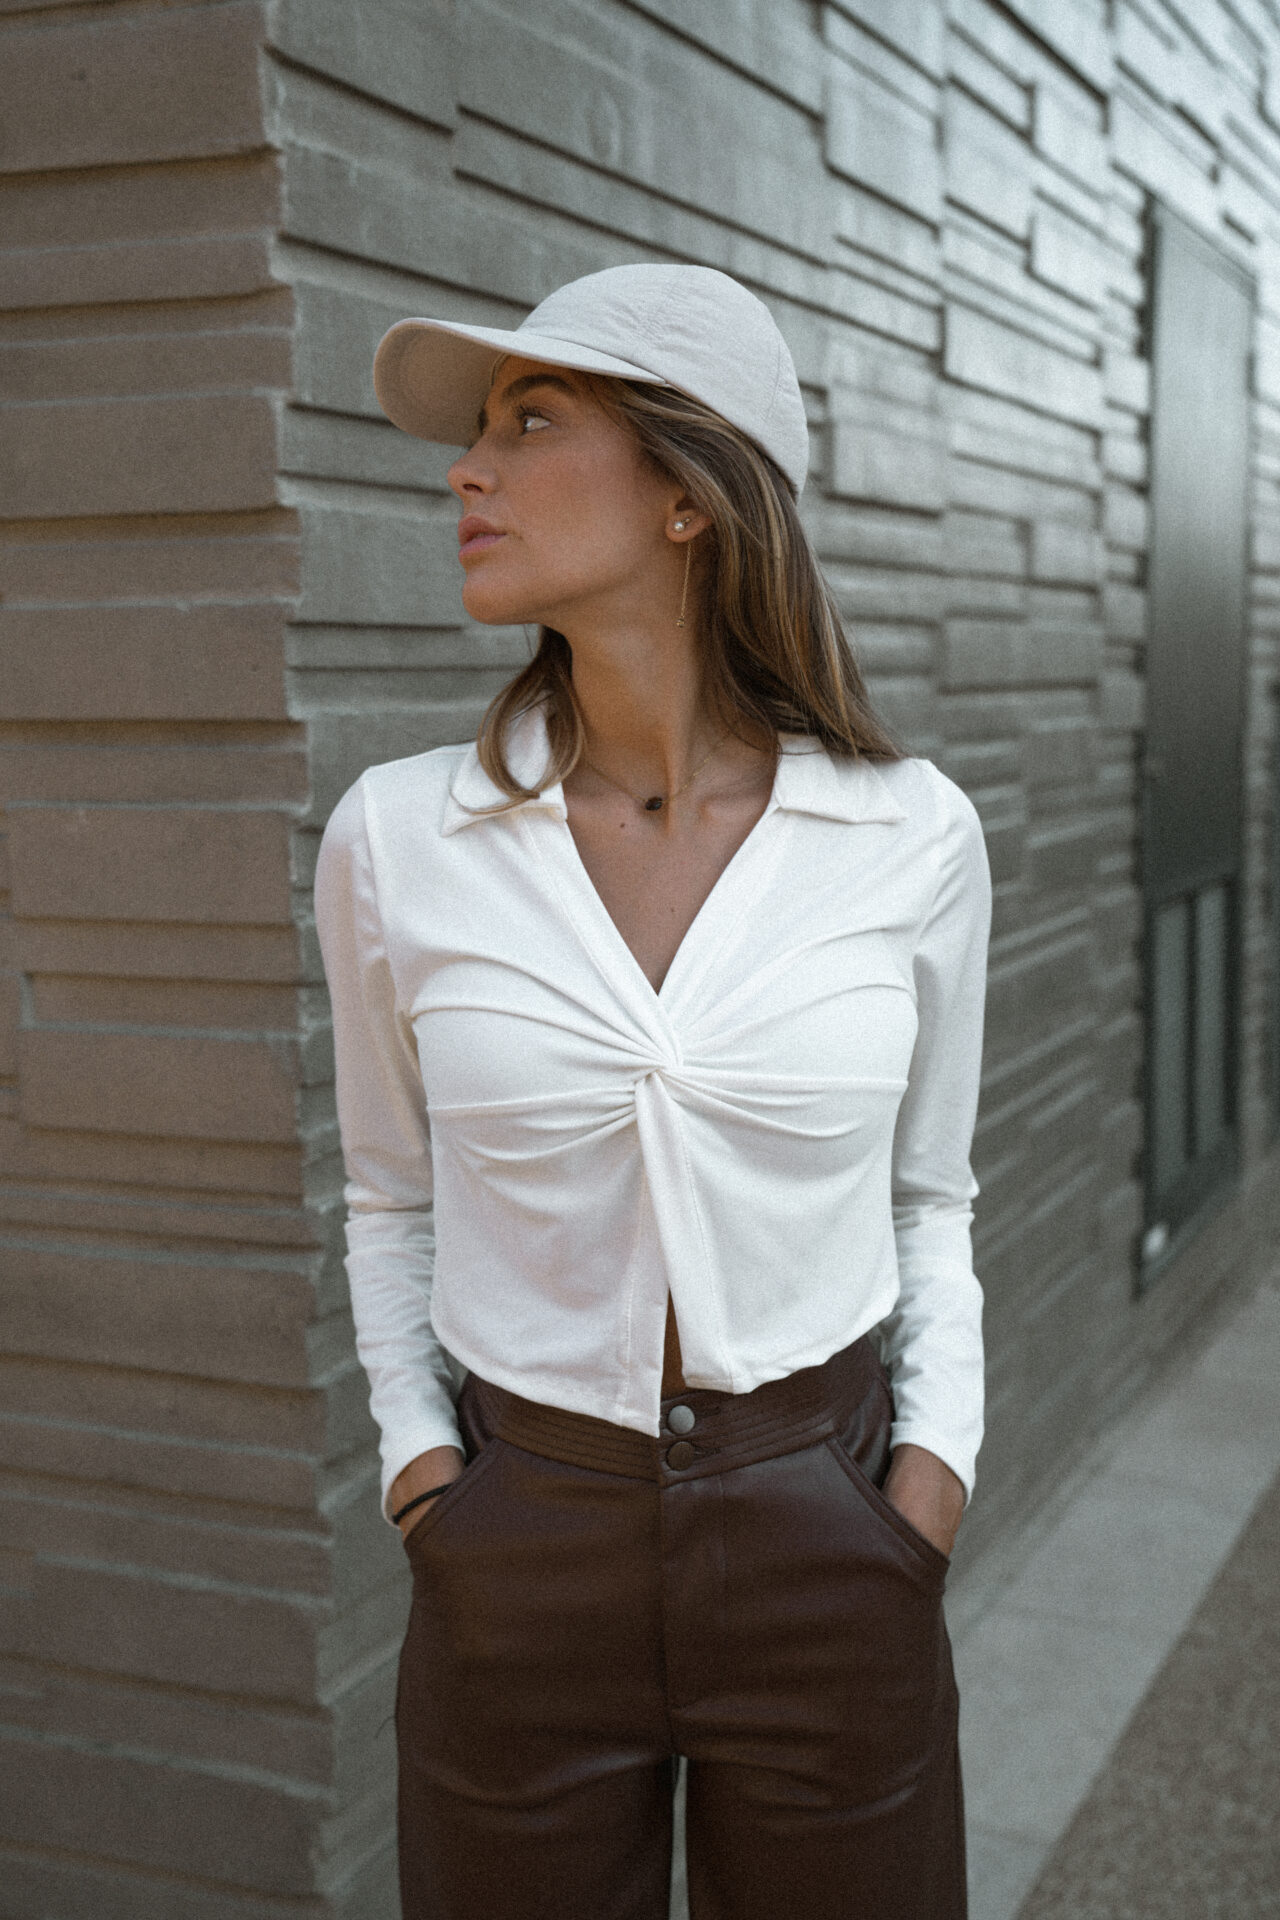 top-chemise-blanc-casquette-pantalon-simili-marron-femme-gisette-store (16)